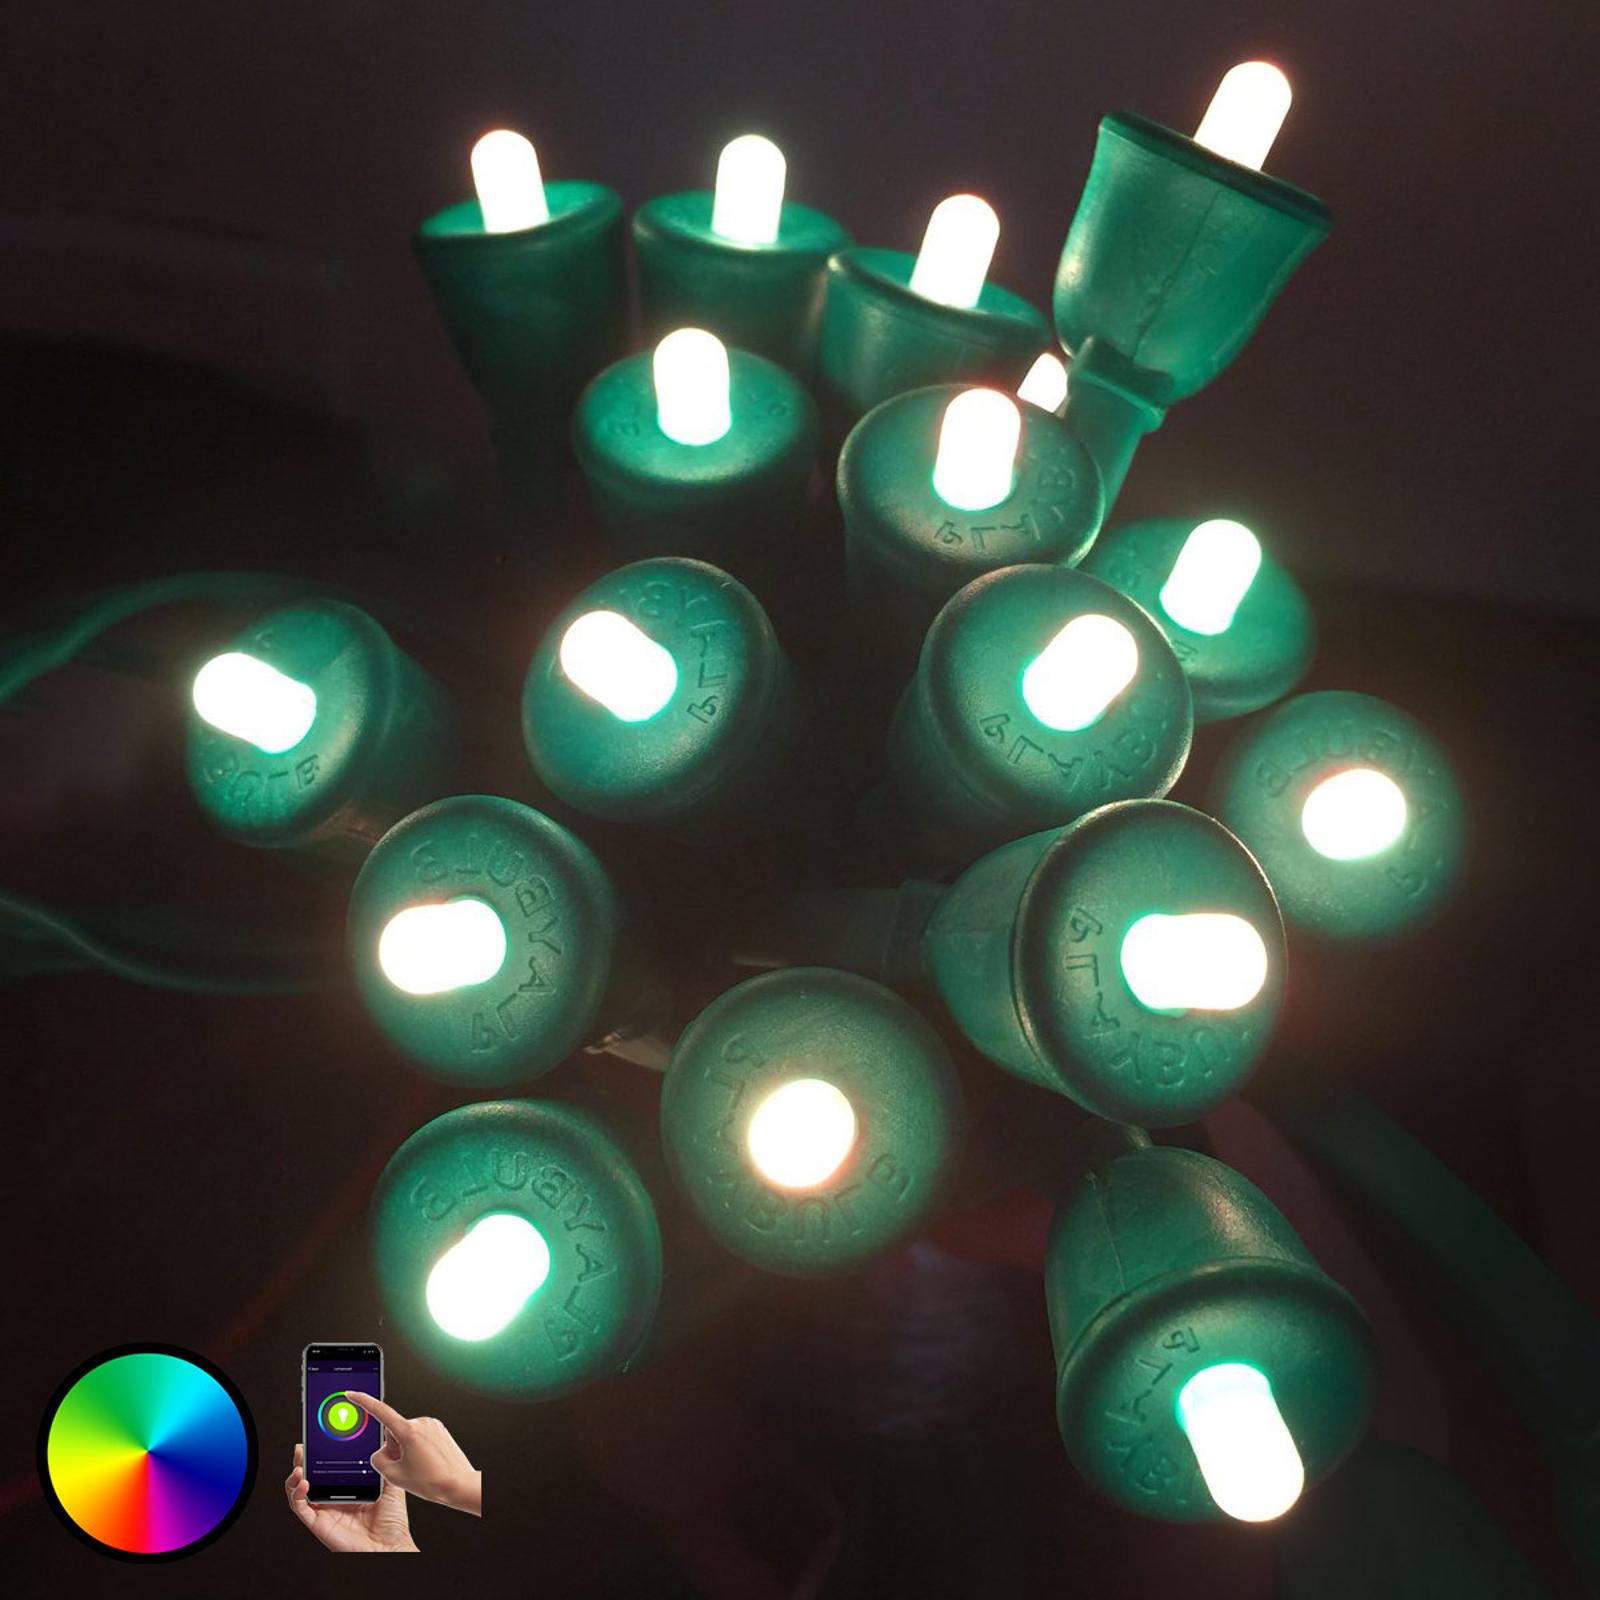 MiPow Playbulb String guirlande LED 15 m, vert